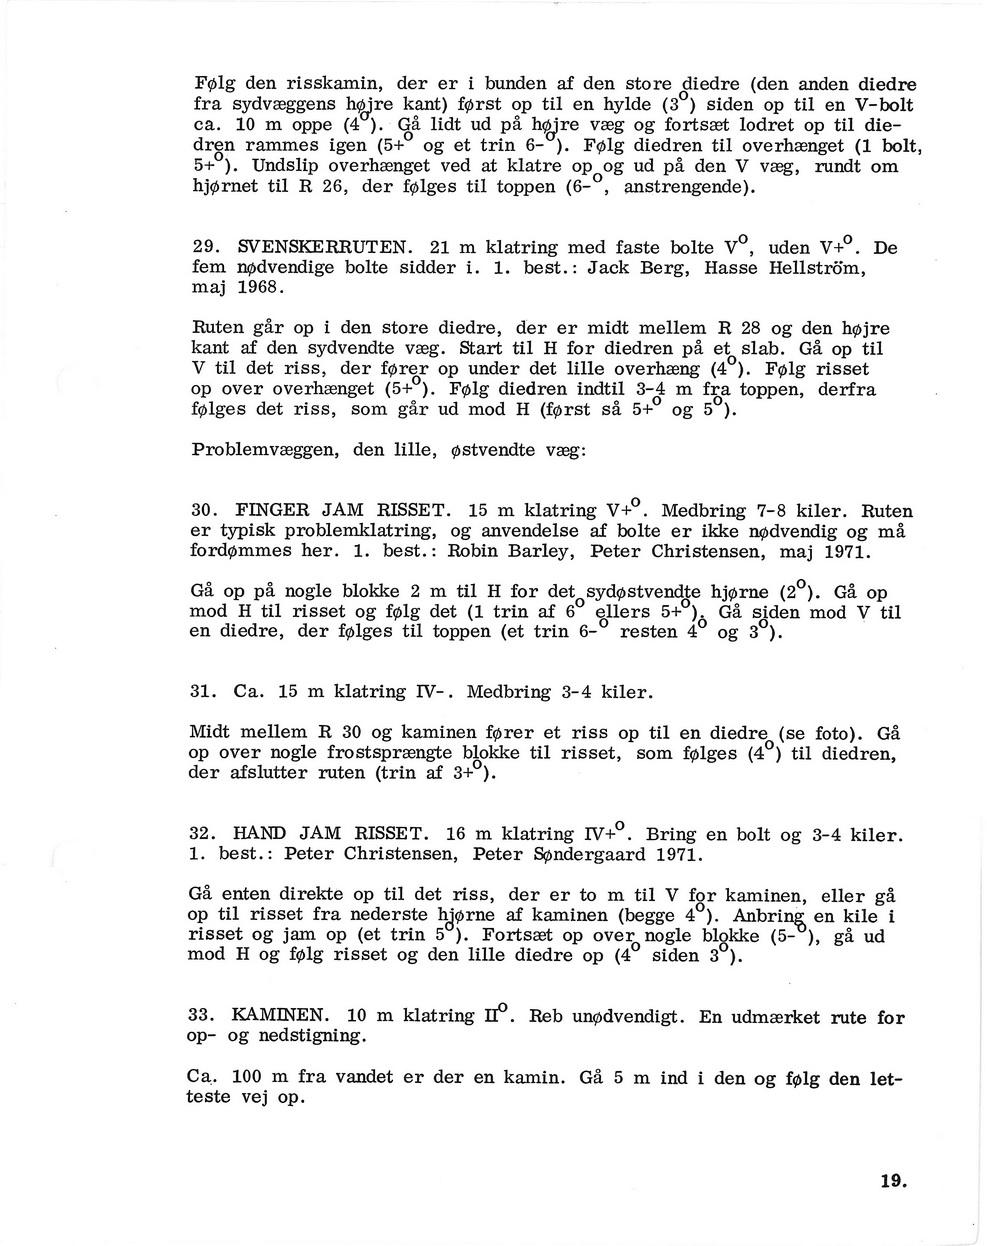 Kullen guide 1972 019.jpg